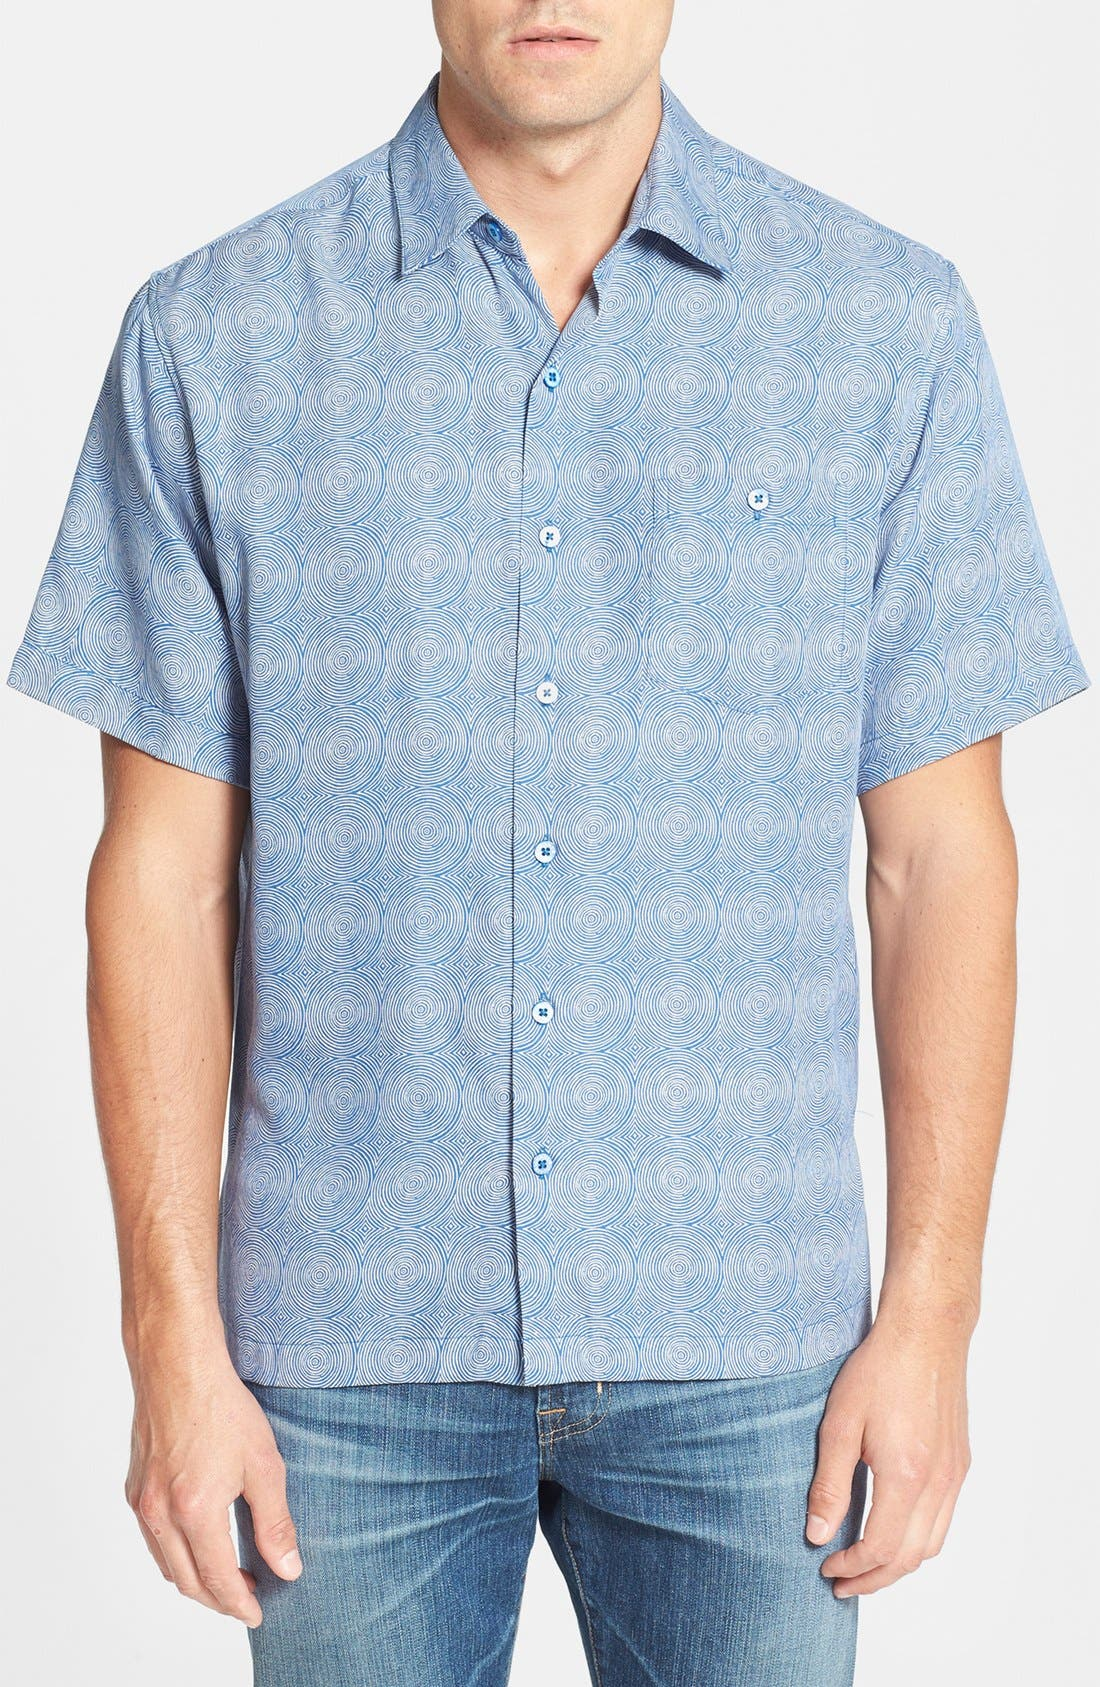 Alternate Image 1 Selected - Tori Richard 'Trance' Classic Fit Short Sleeve Silk Blend Sport Shirt